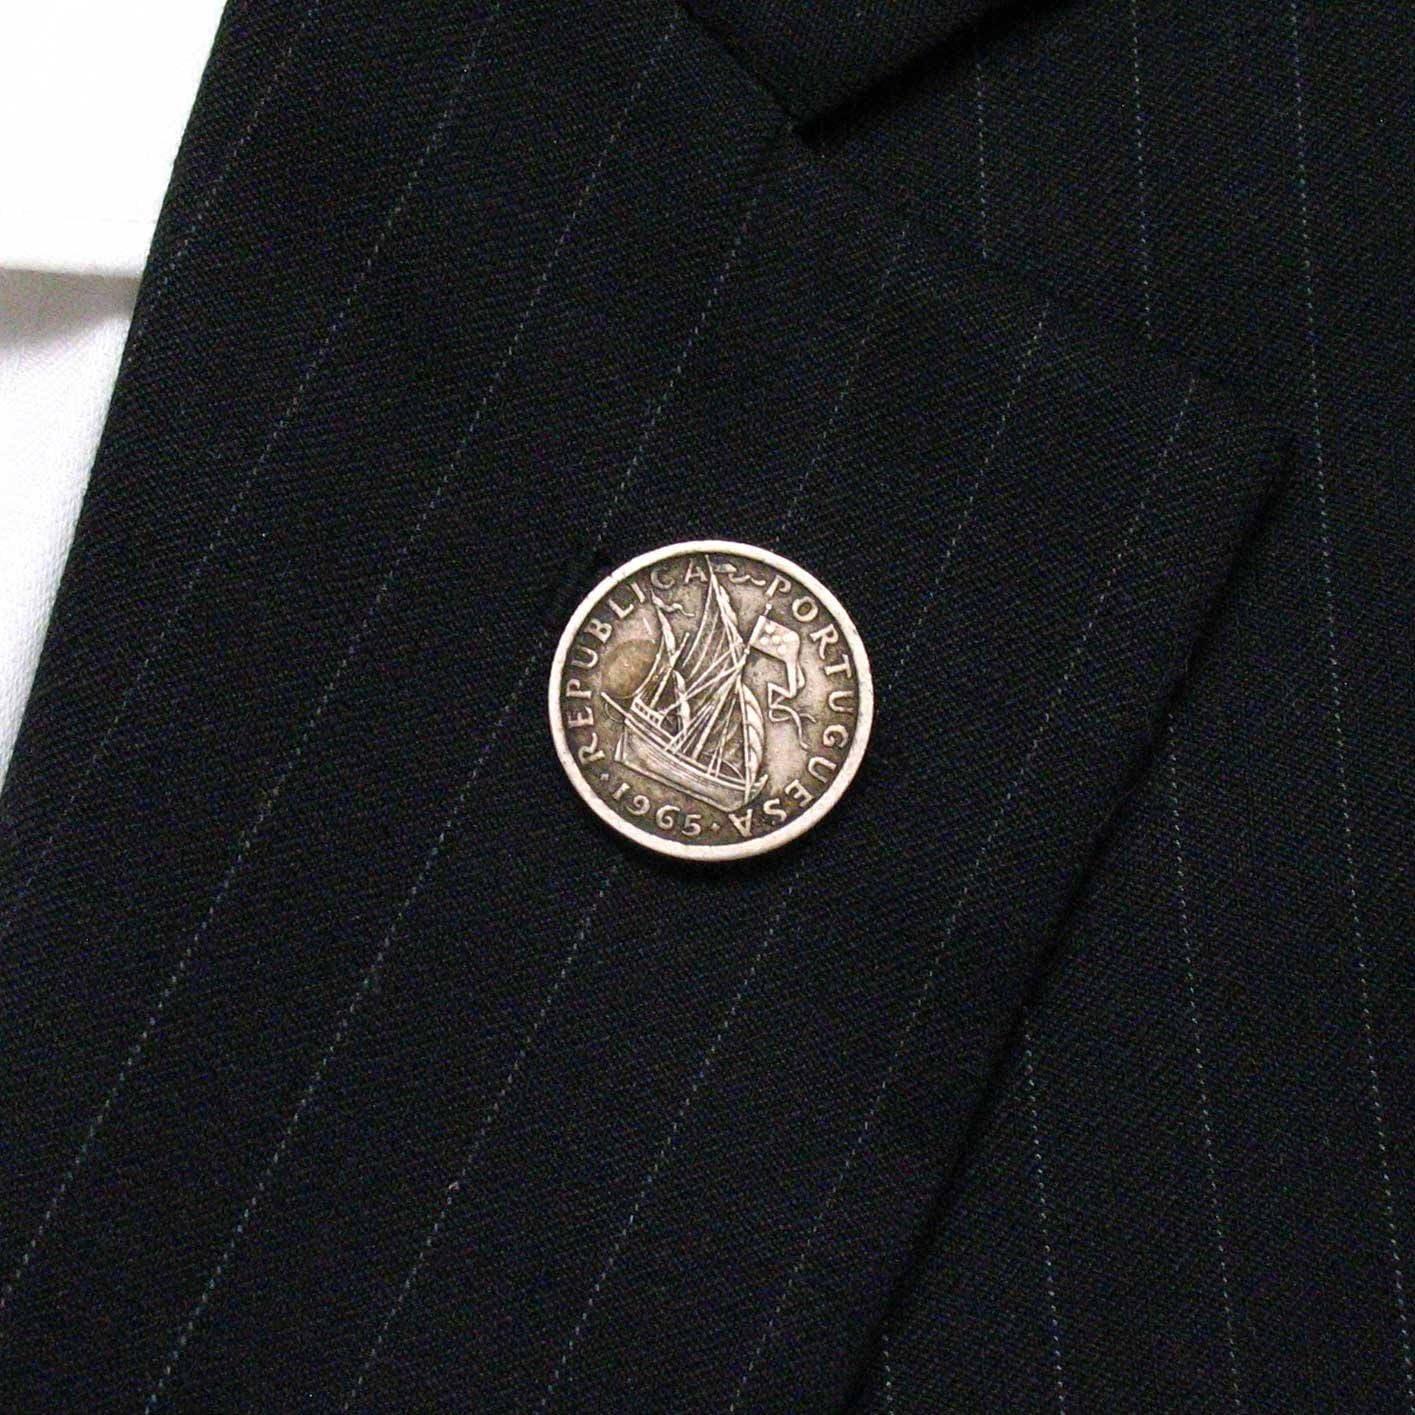 Portugal moneda Tie Tack – Pin bandera Lisboa argave Terno ...